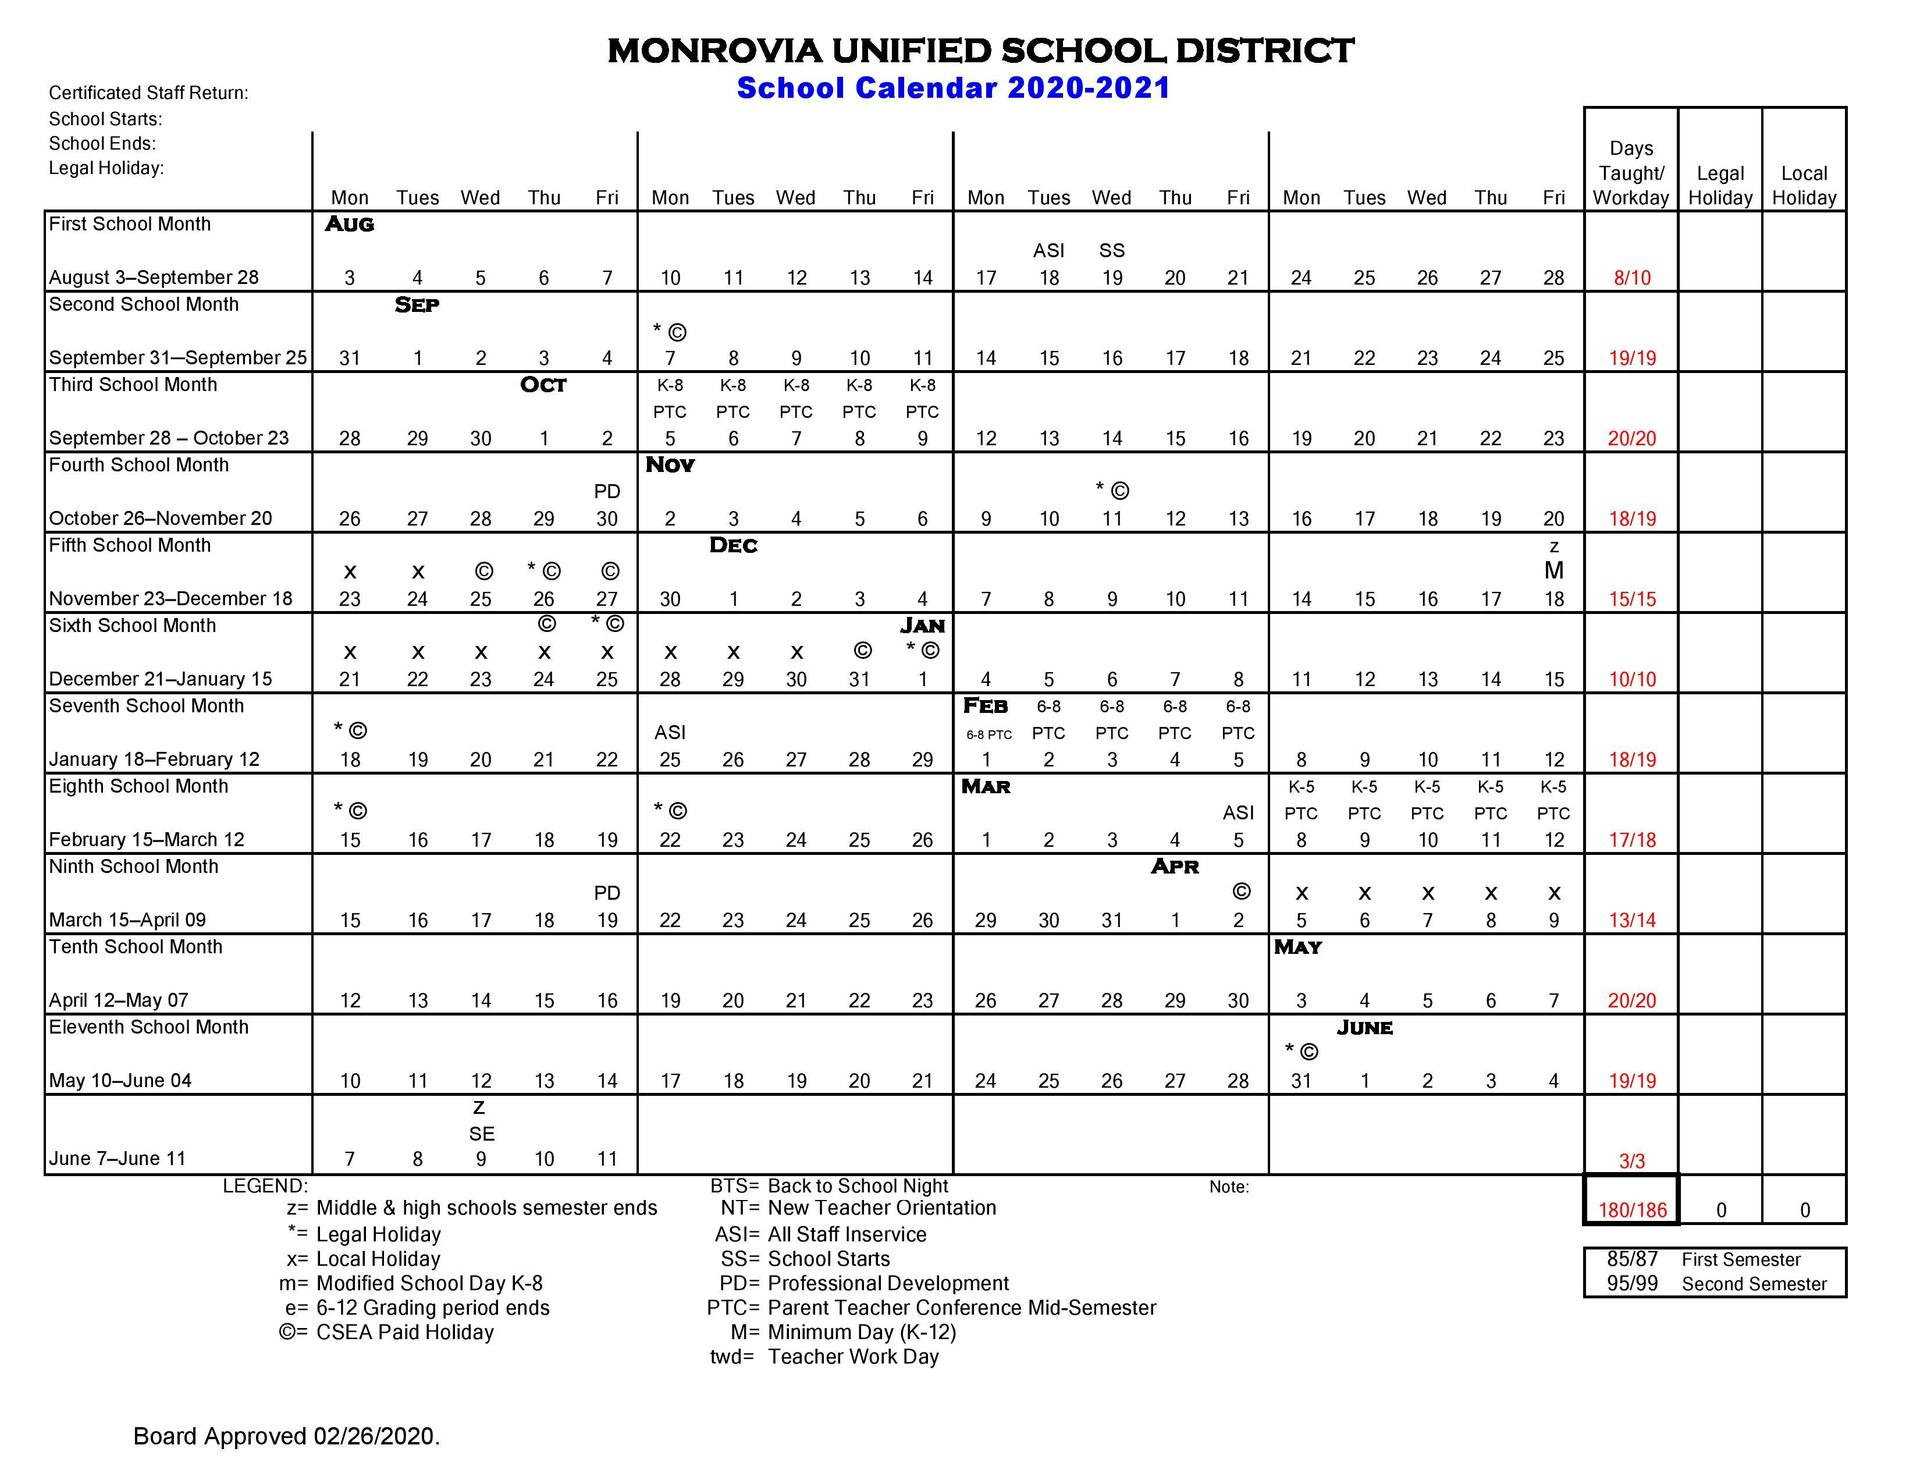 District Calendar p2